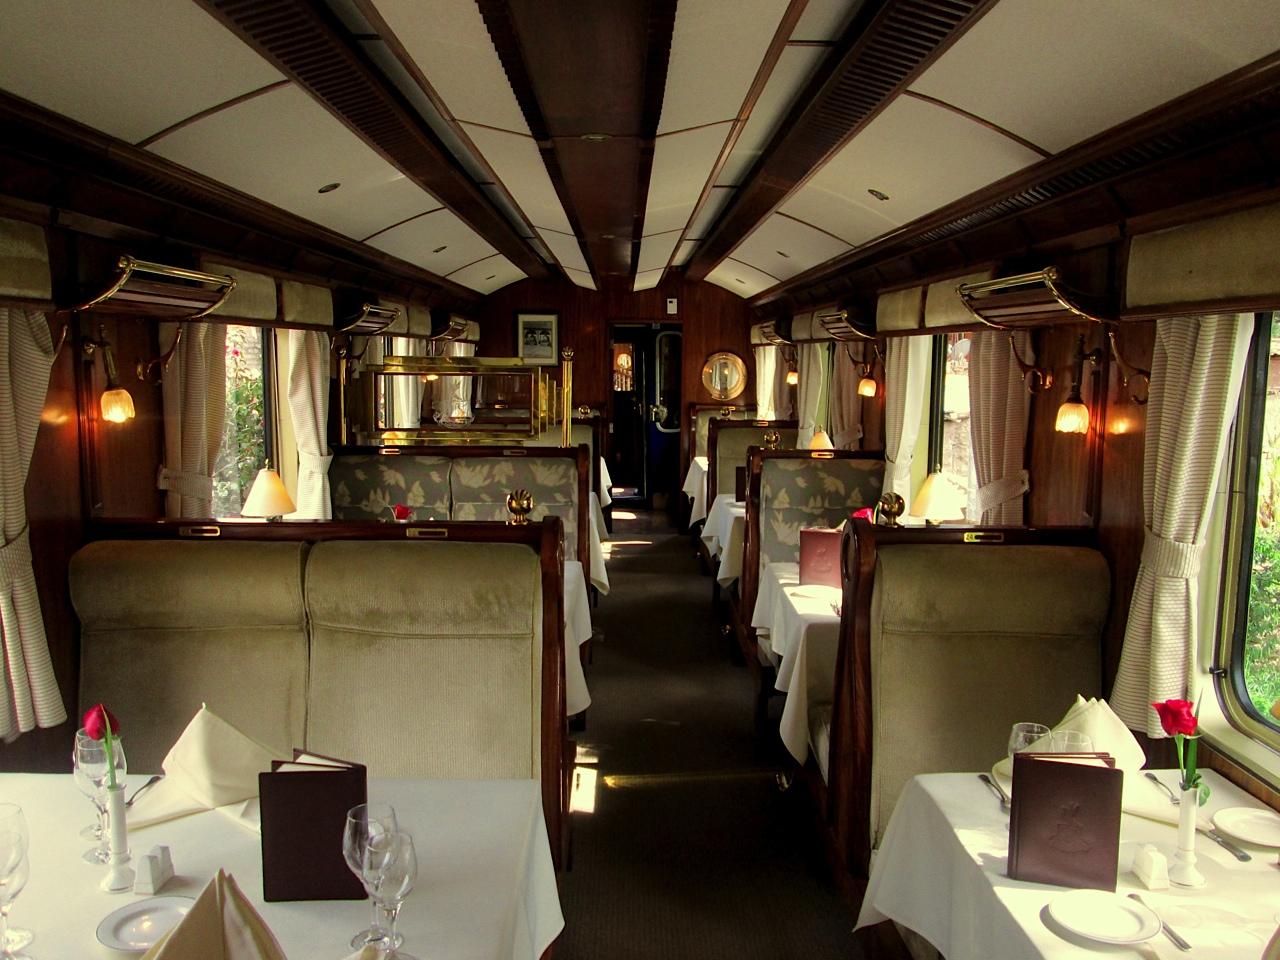 The Hiram Bingham Train Dining Car